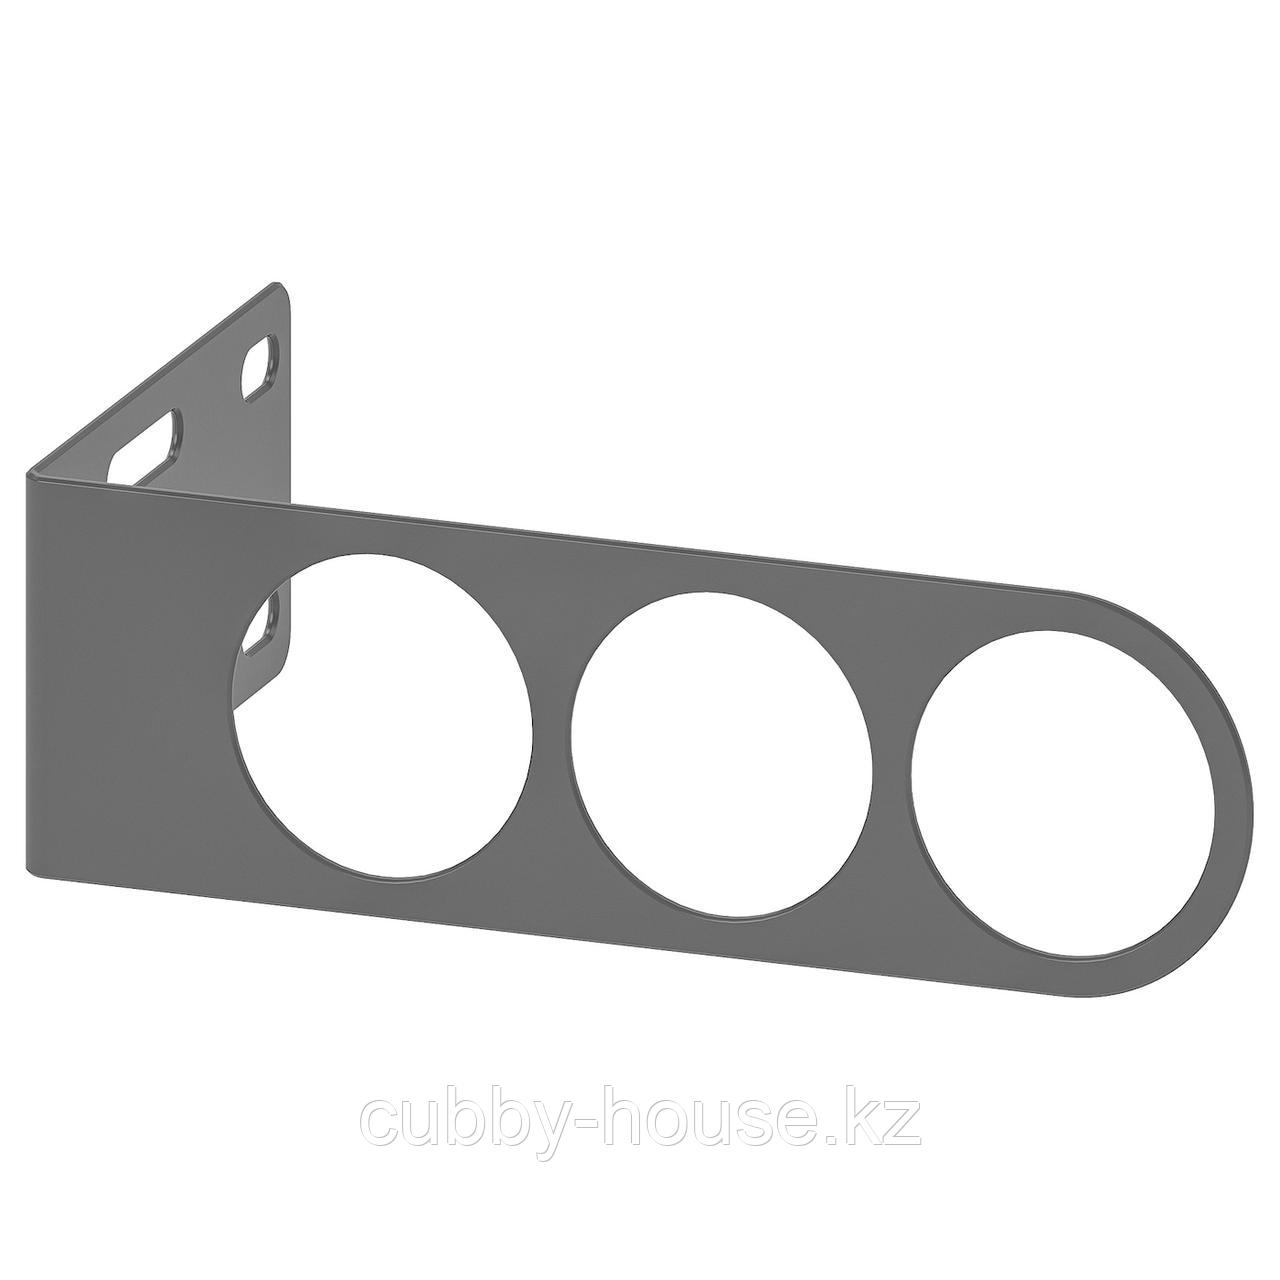 КОМПЛИМЕНТ Вешалка для плечиков, темно-серый, 17x5 см